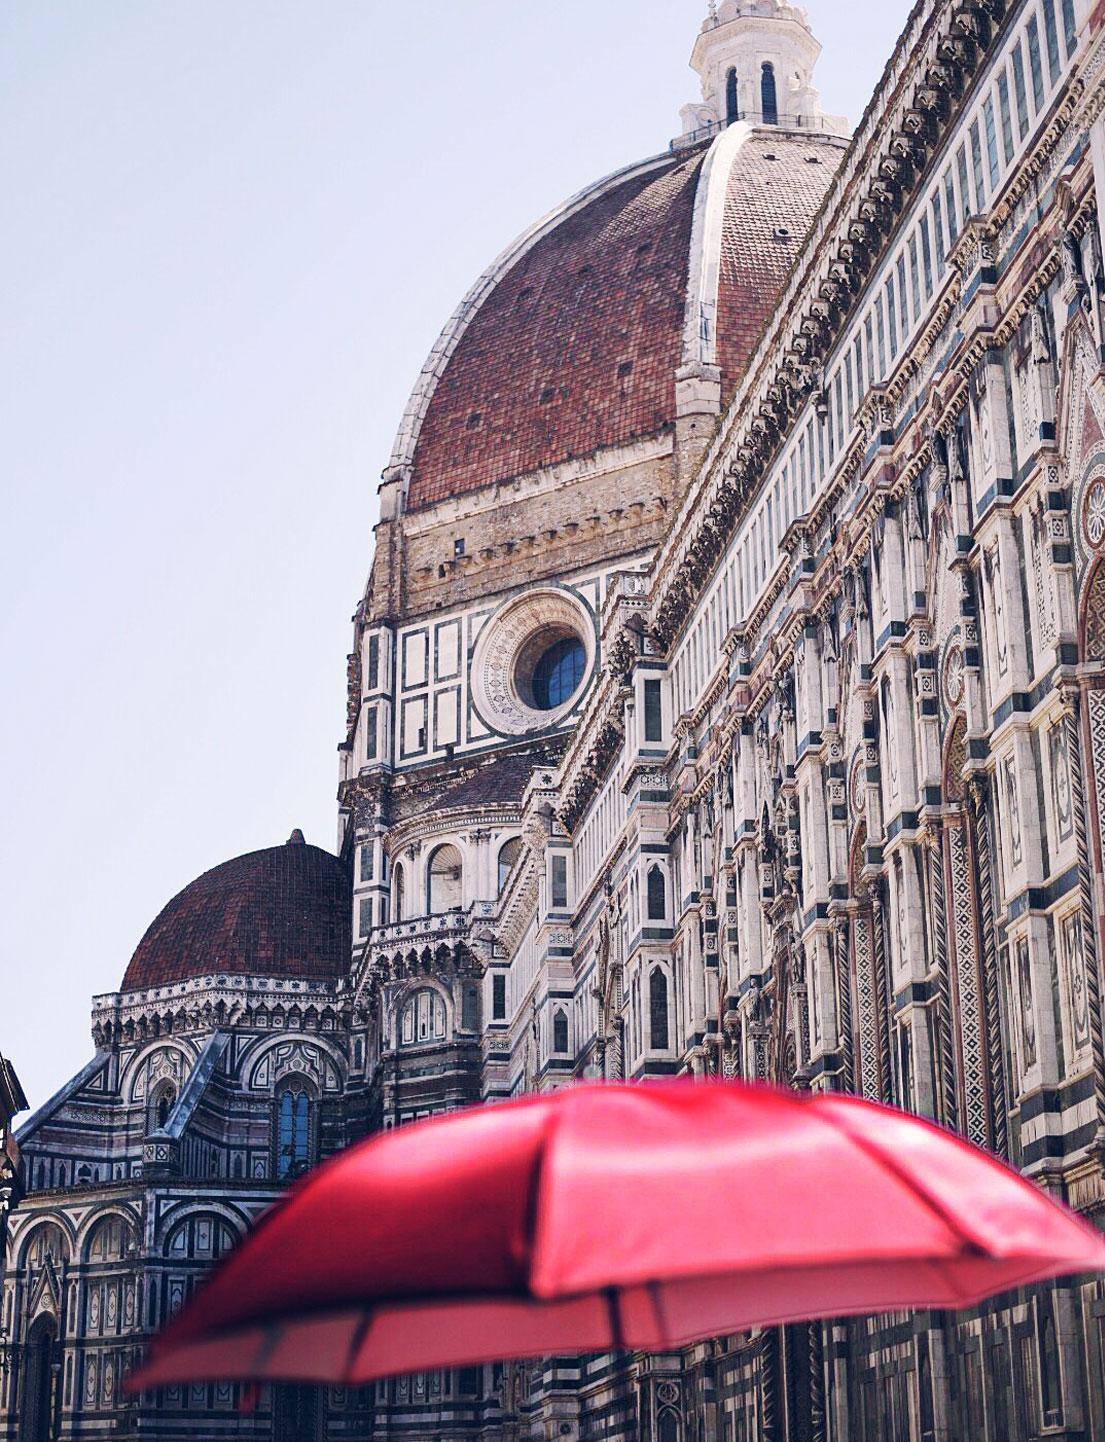 Travel Diary: Staycation At Belmond Villa San Michele